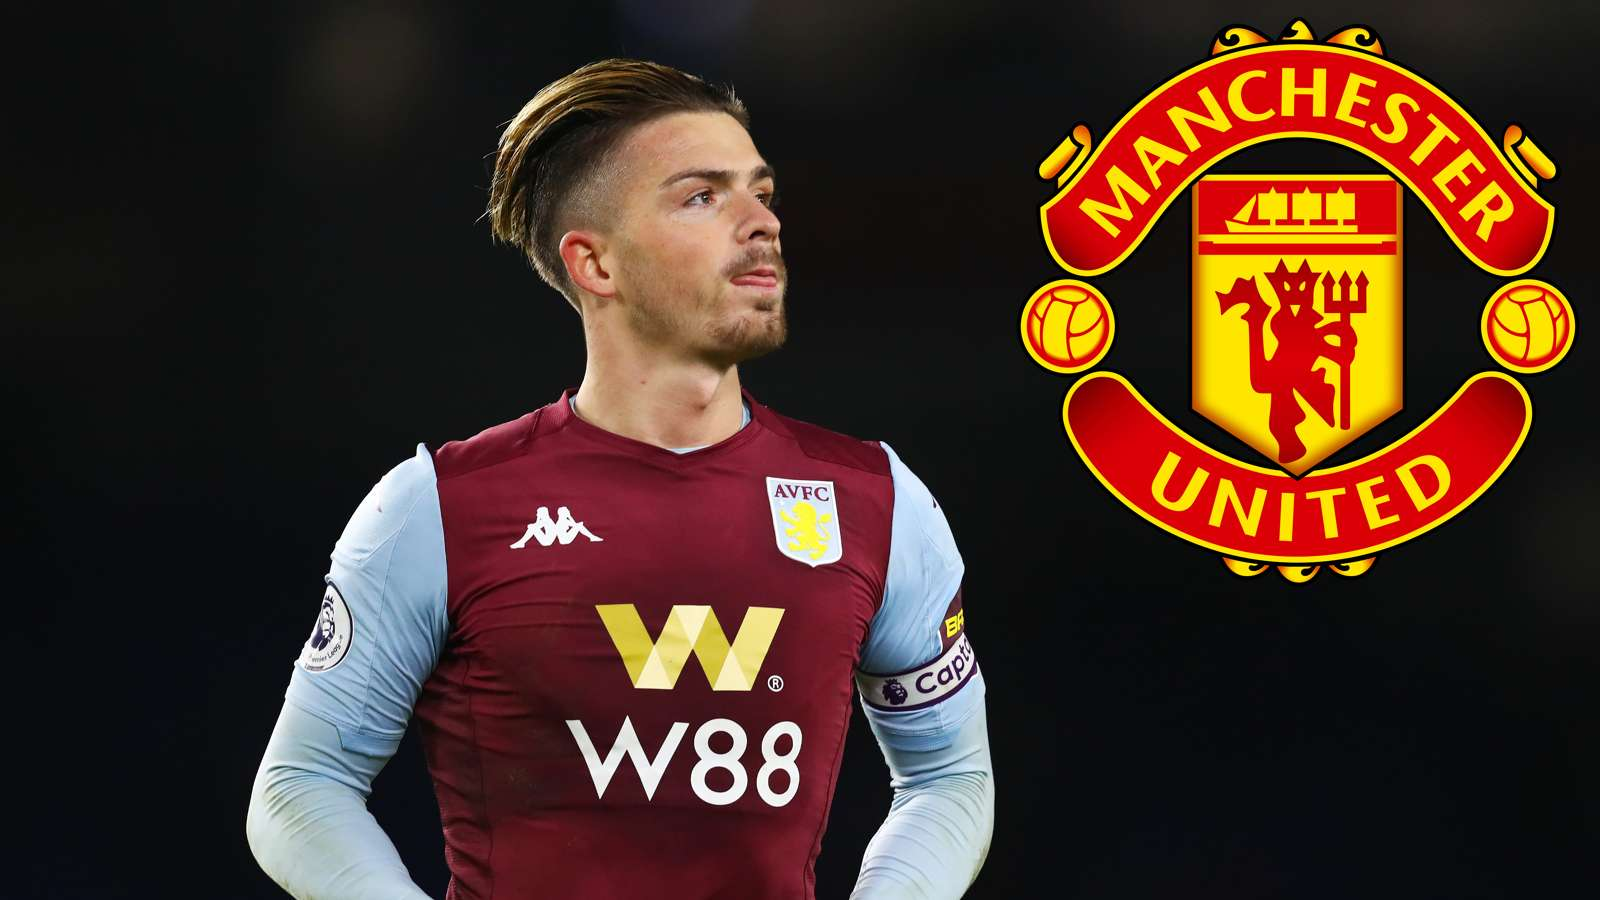 استون ویلا-لیگ برتر انگلیس-انگلستان-Aston Villa-Premier League-England